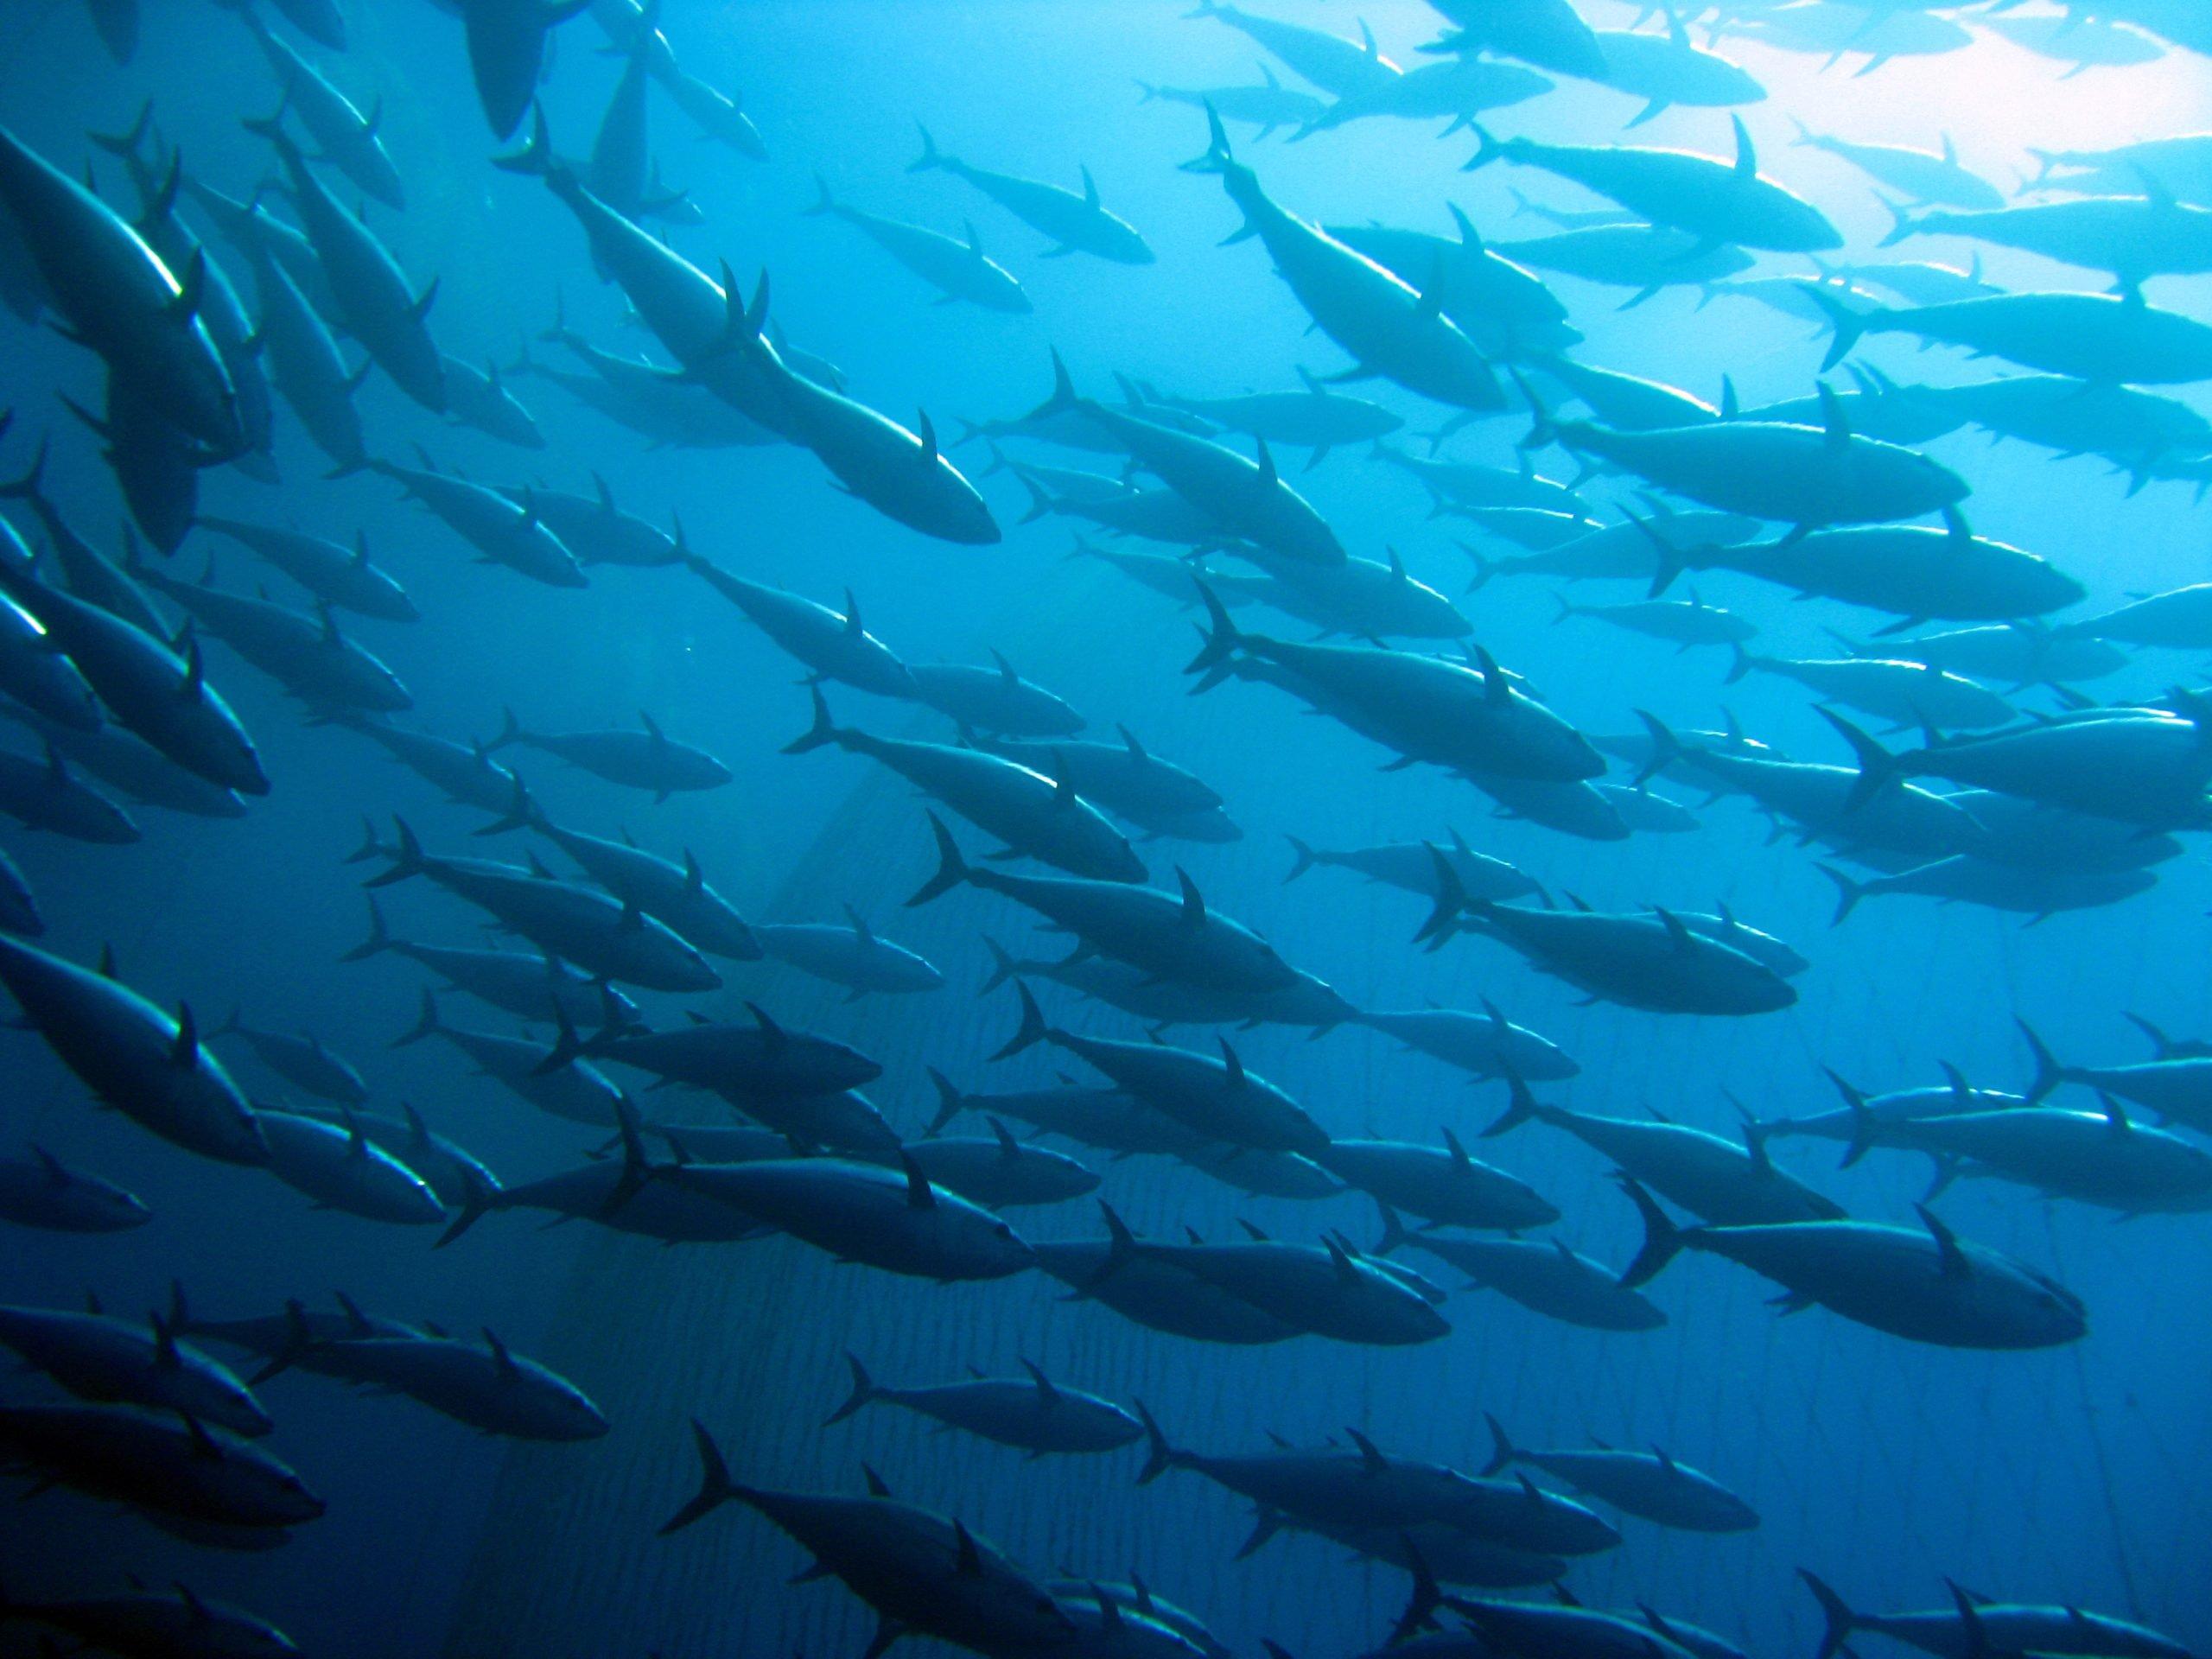 bluefin tuna school swimming in atlantic ocean